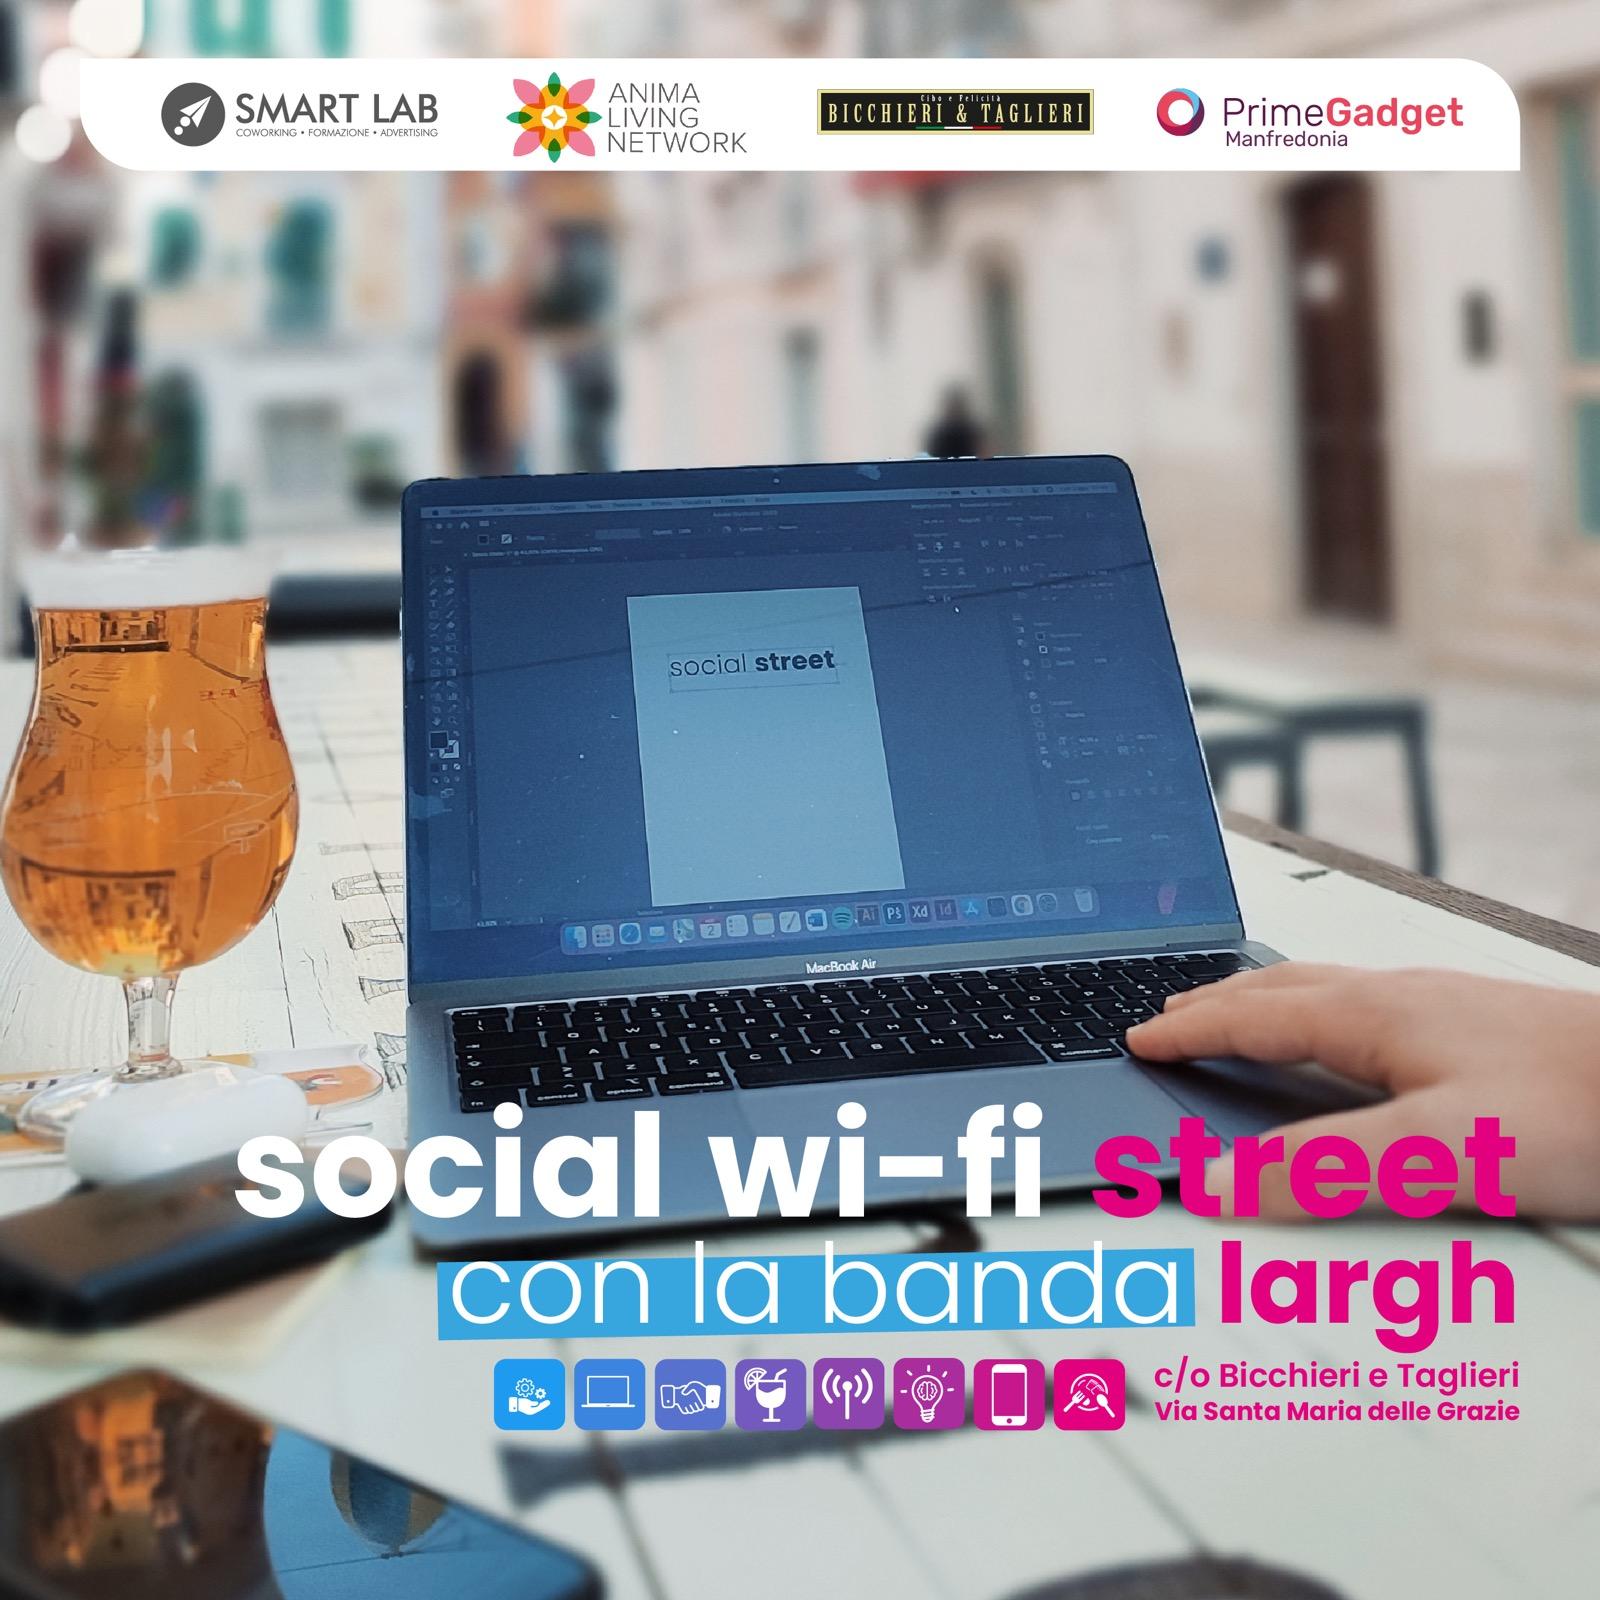 Social Wi-Fi Manfredonia